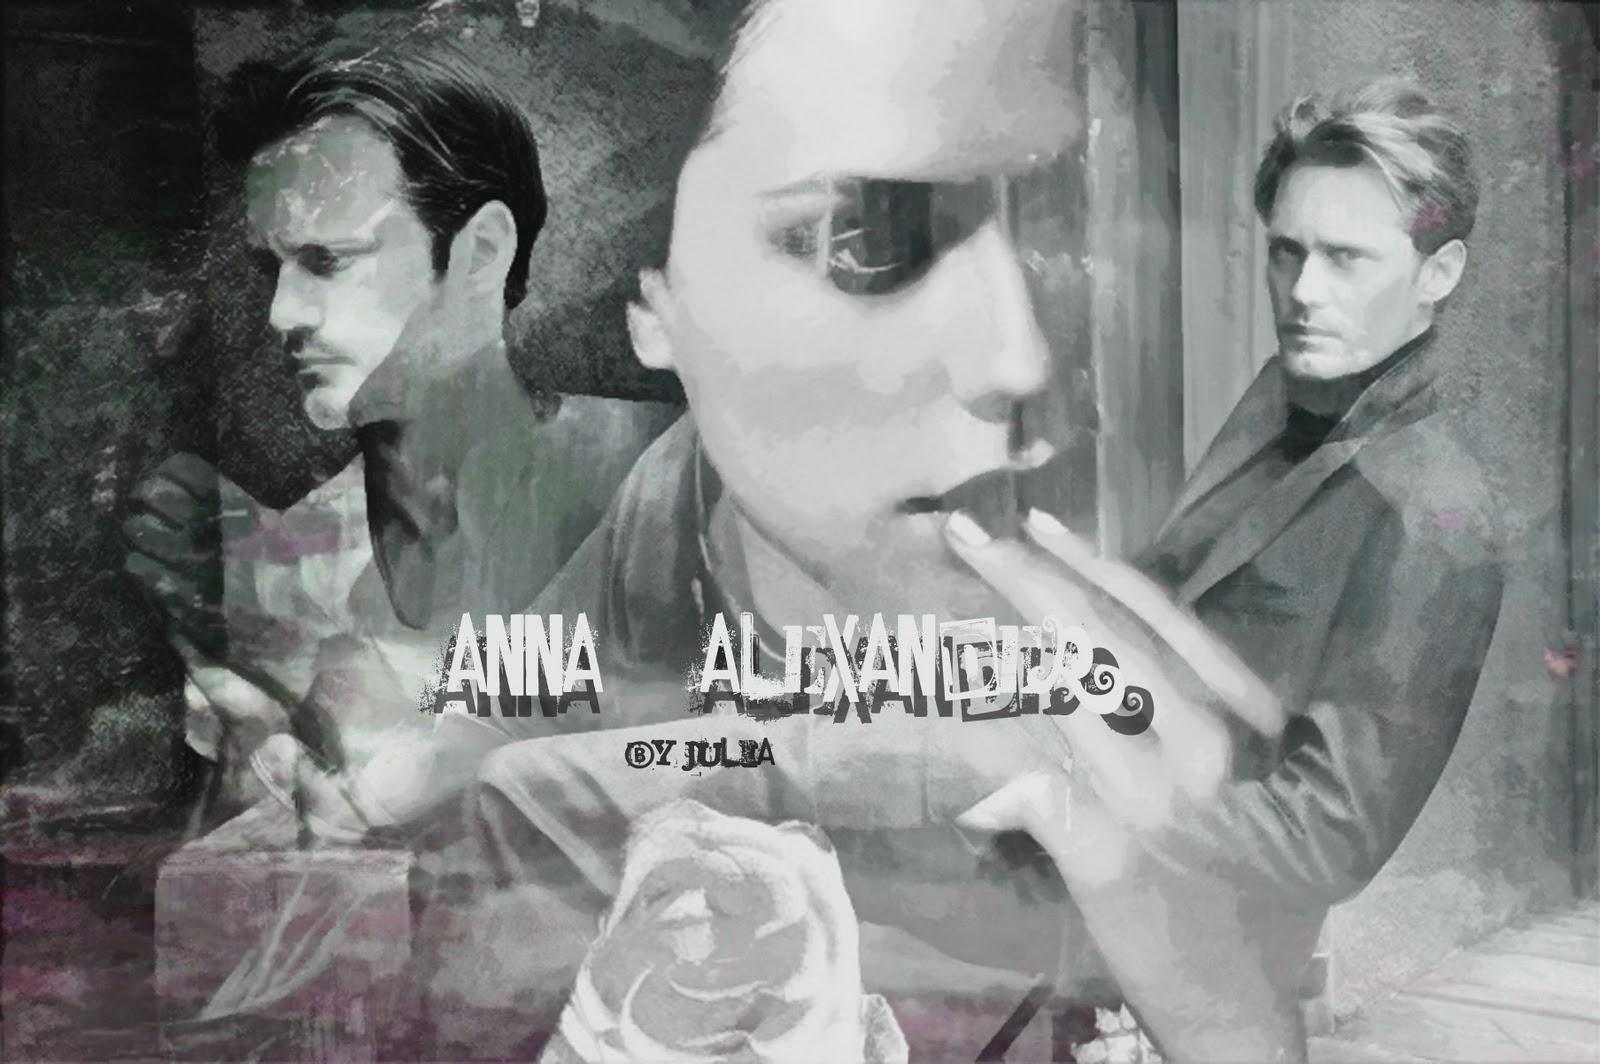 http://2.bp.blogspot.com/-oPZuxT-EiJM/TyryInmju5I/AAAAAAAAFY0/i0u8KoMi0pk/s1600/anna_paquin_and_alexander_skarsgard_by_rylka-d4nn9d0.jpg